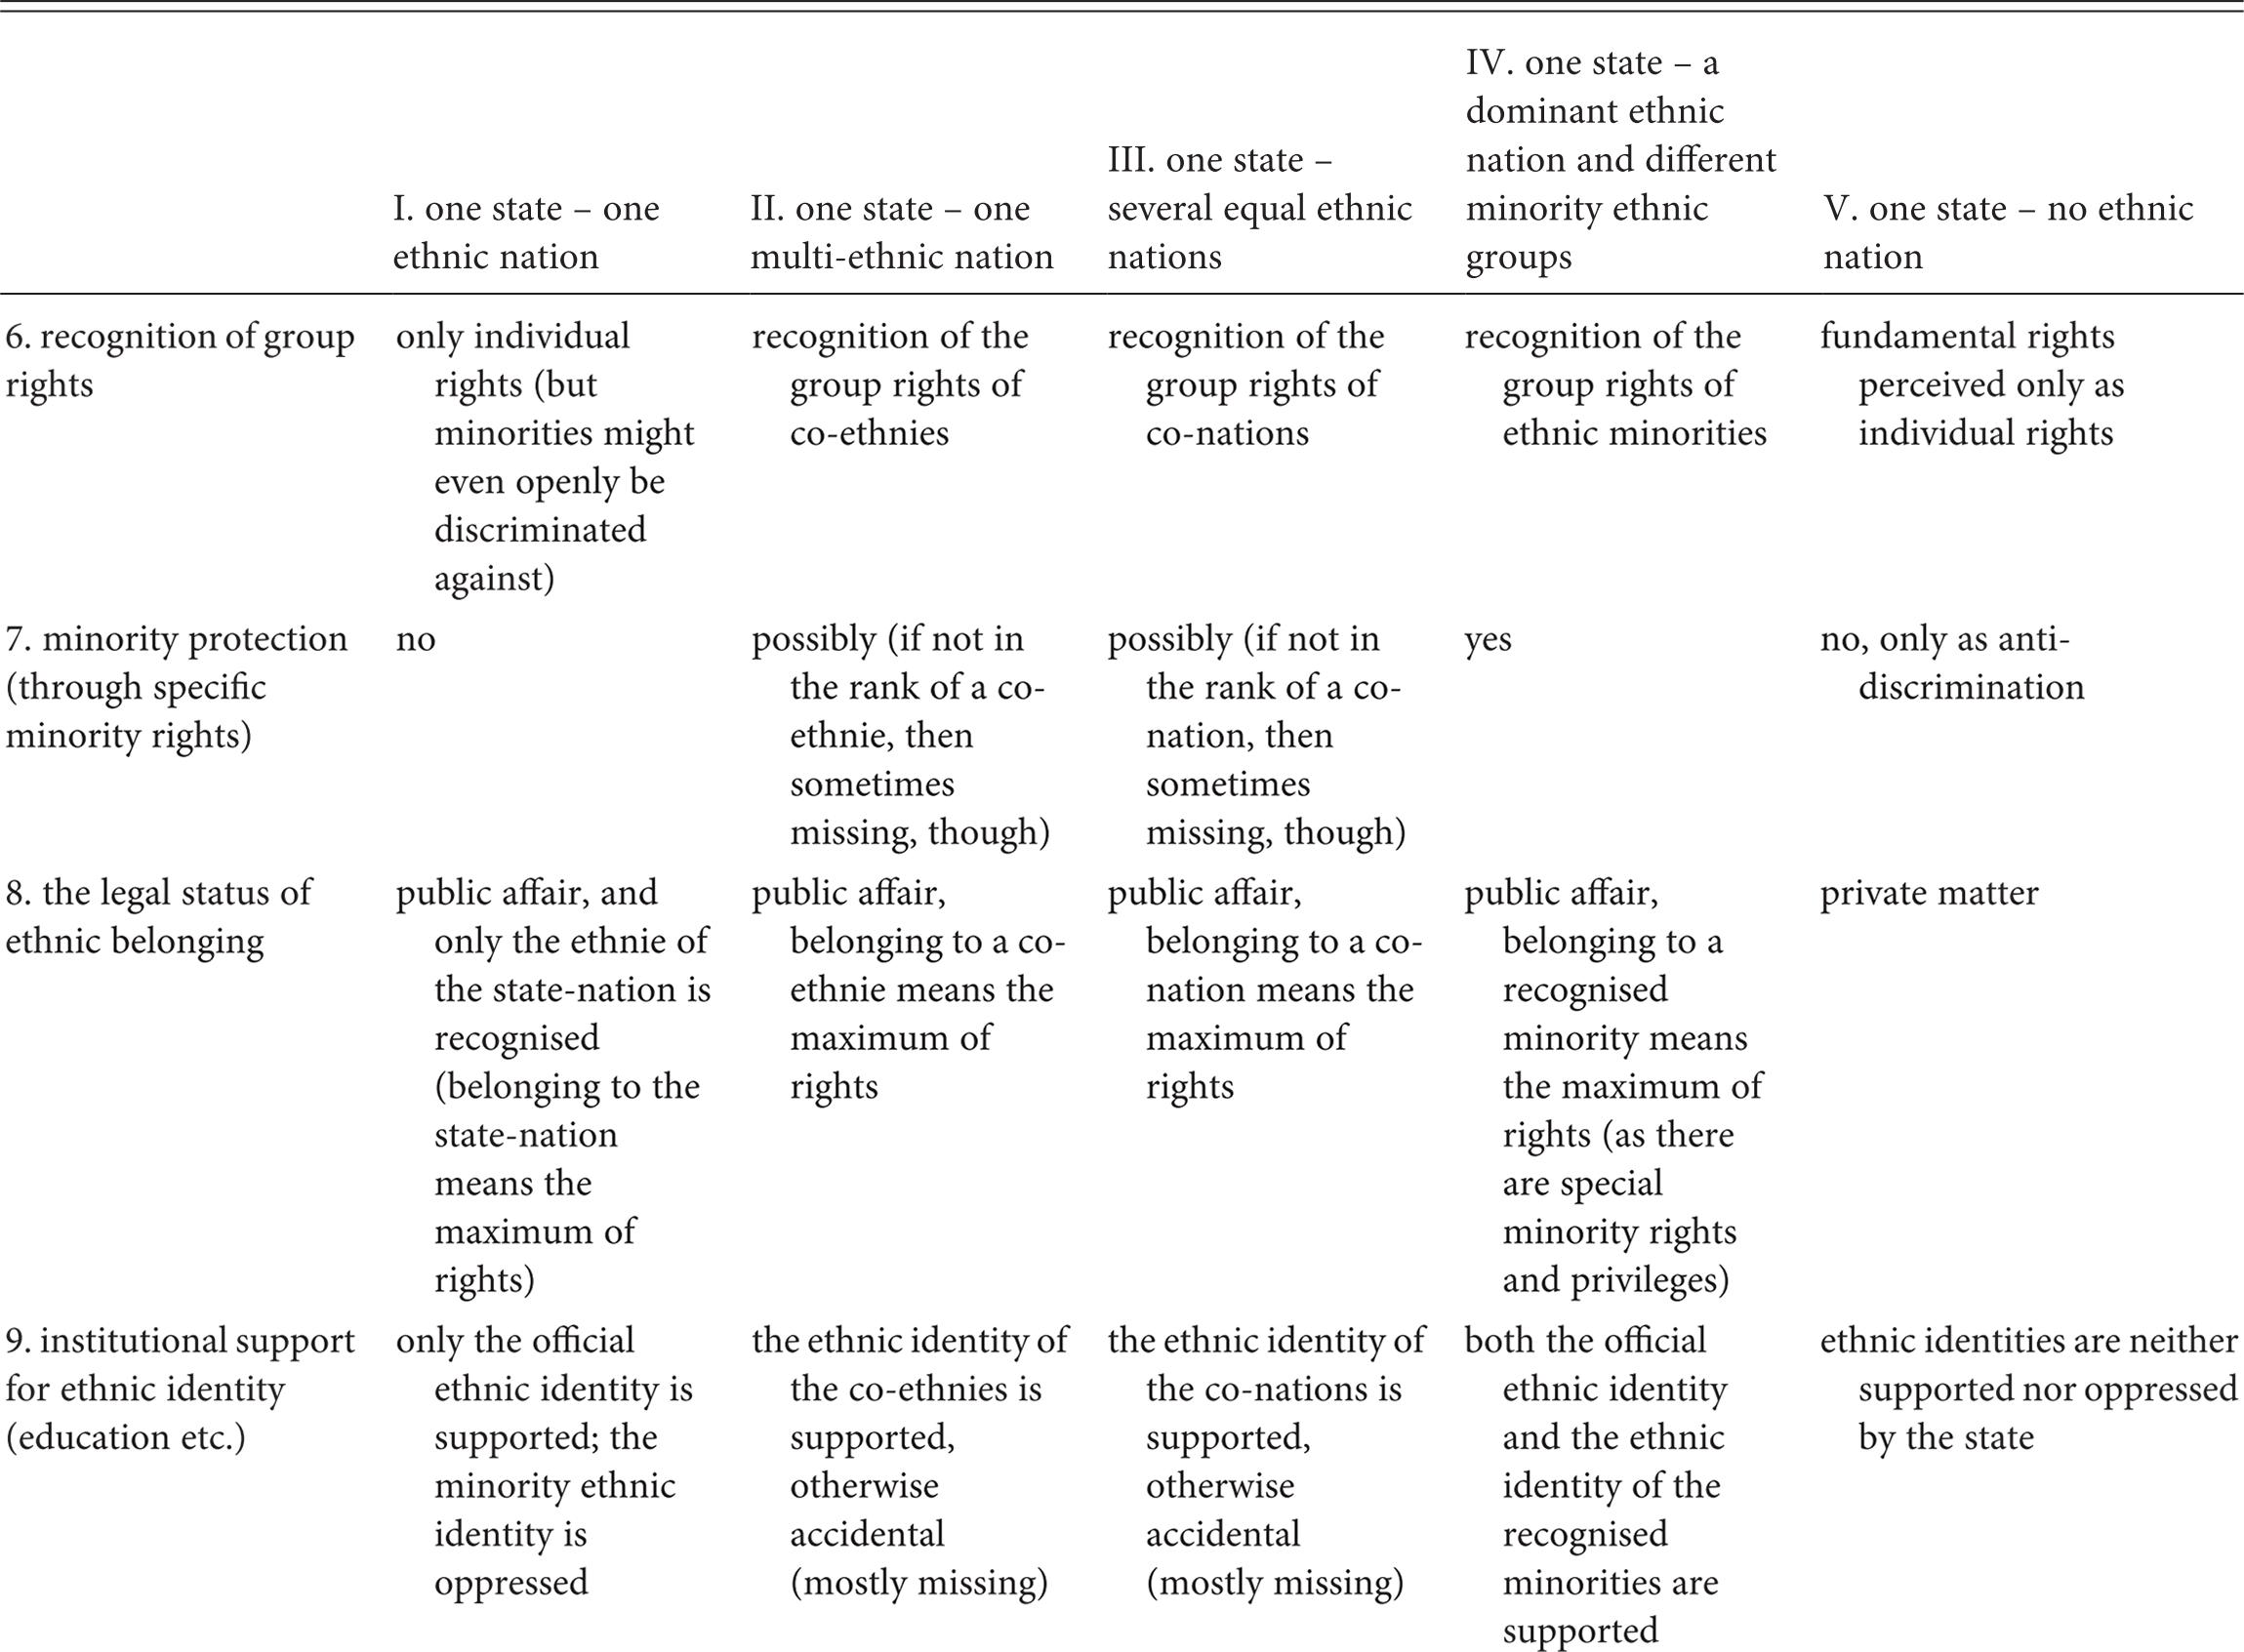 Esl dissertation proposal writing service for university